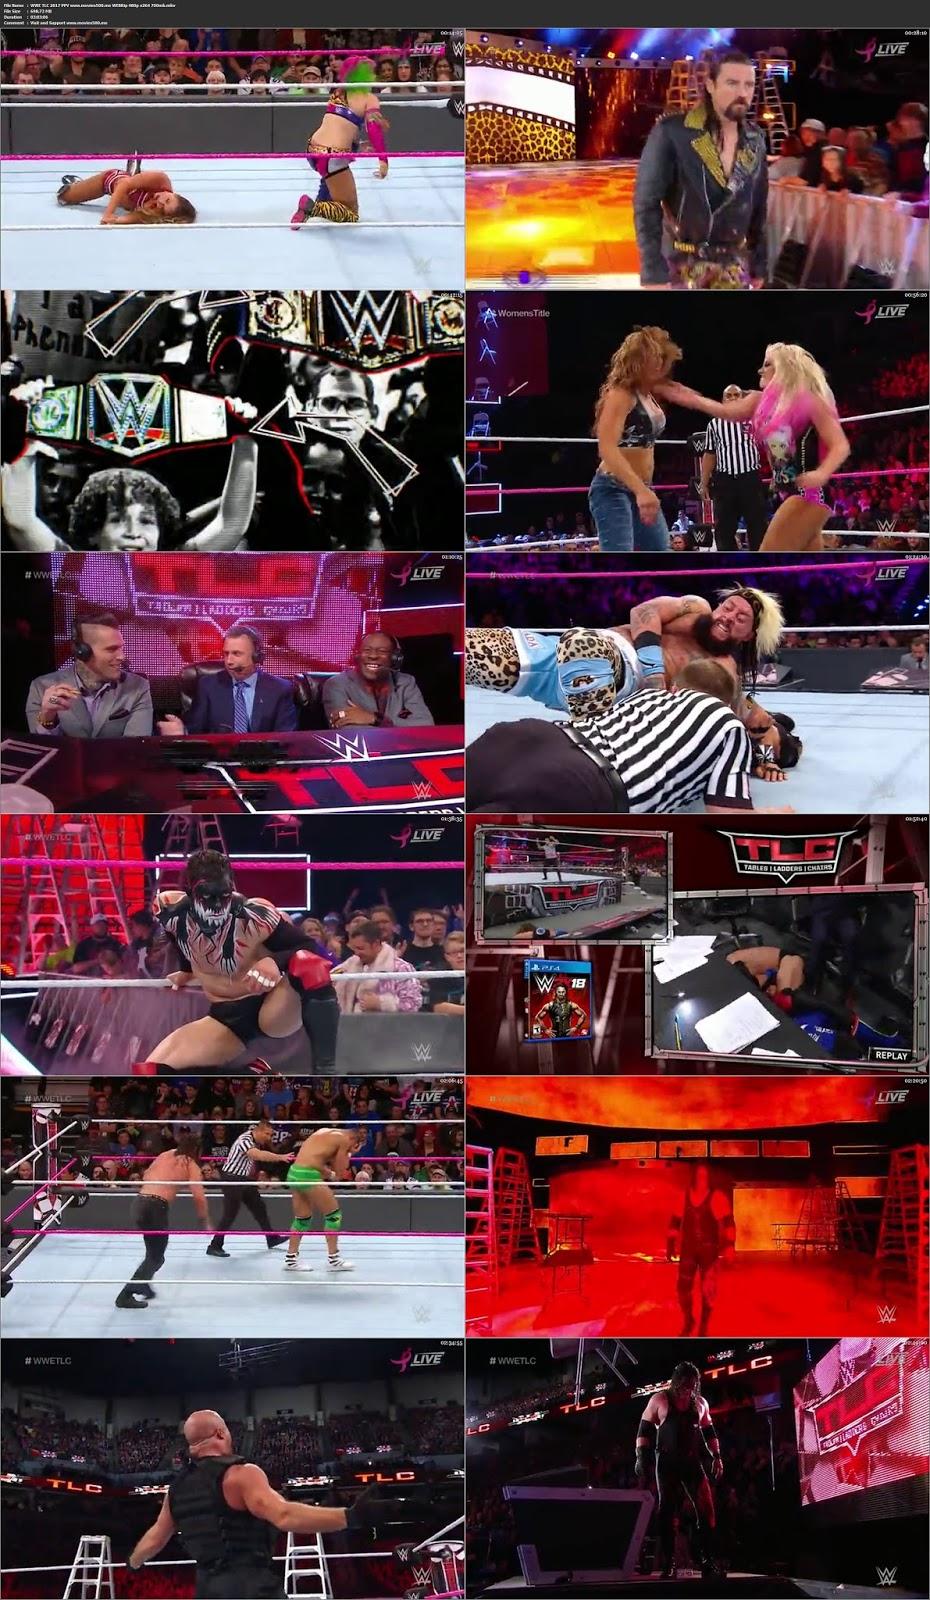 WWE TLC 2017 Full Wrestling Show WEBRip 480p at freedomcopy.com